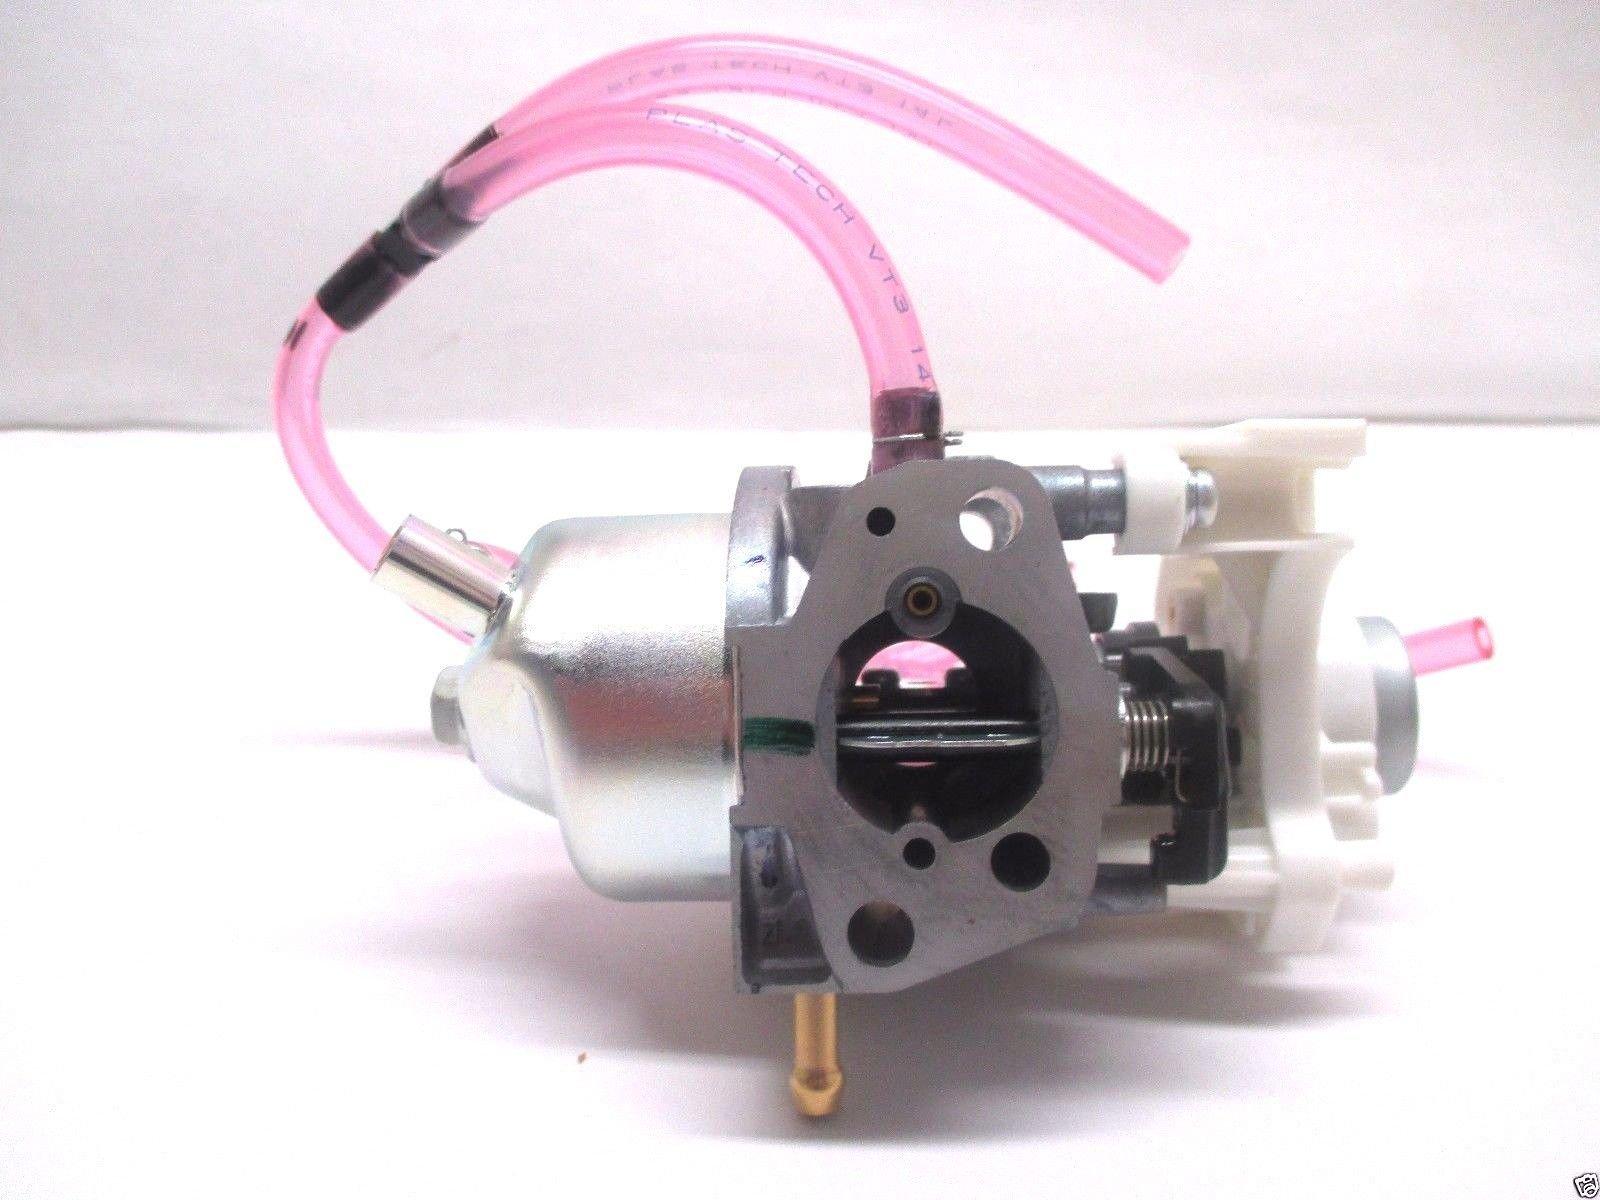 Honda Carburetor Assy. Part # 16100-ZL0-D66 by Honda (Image #1)